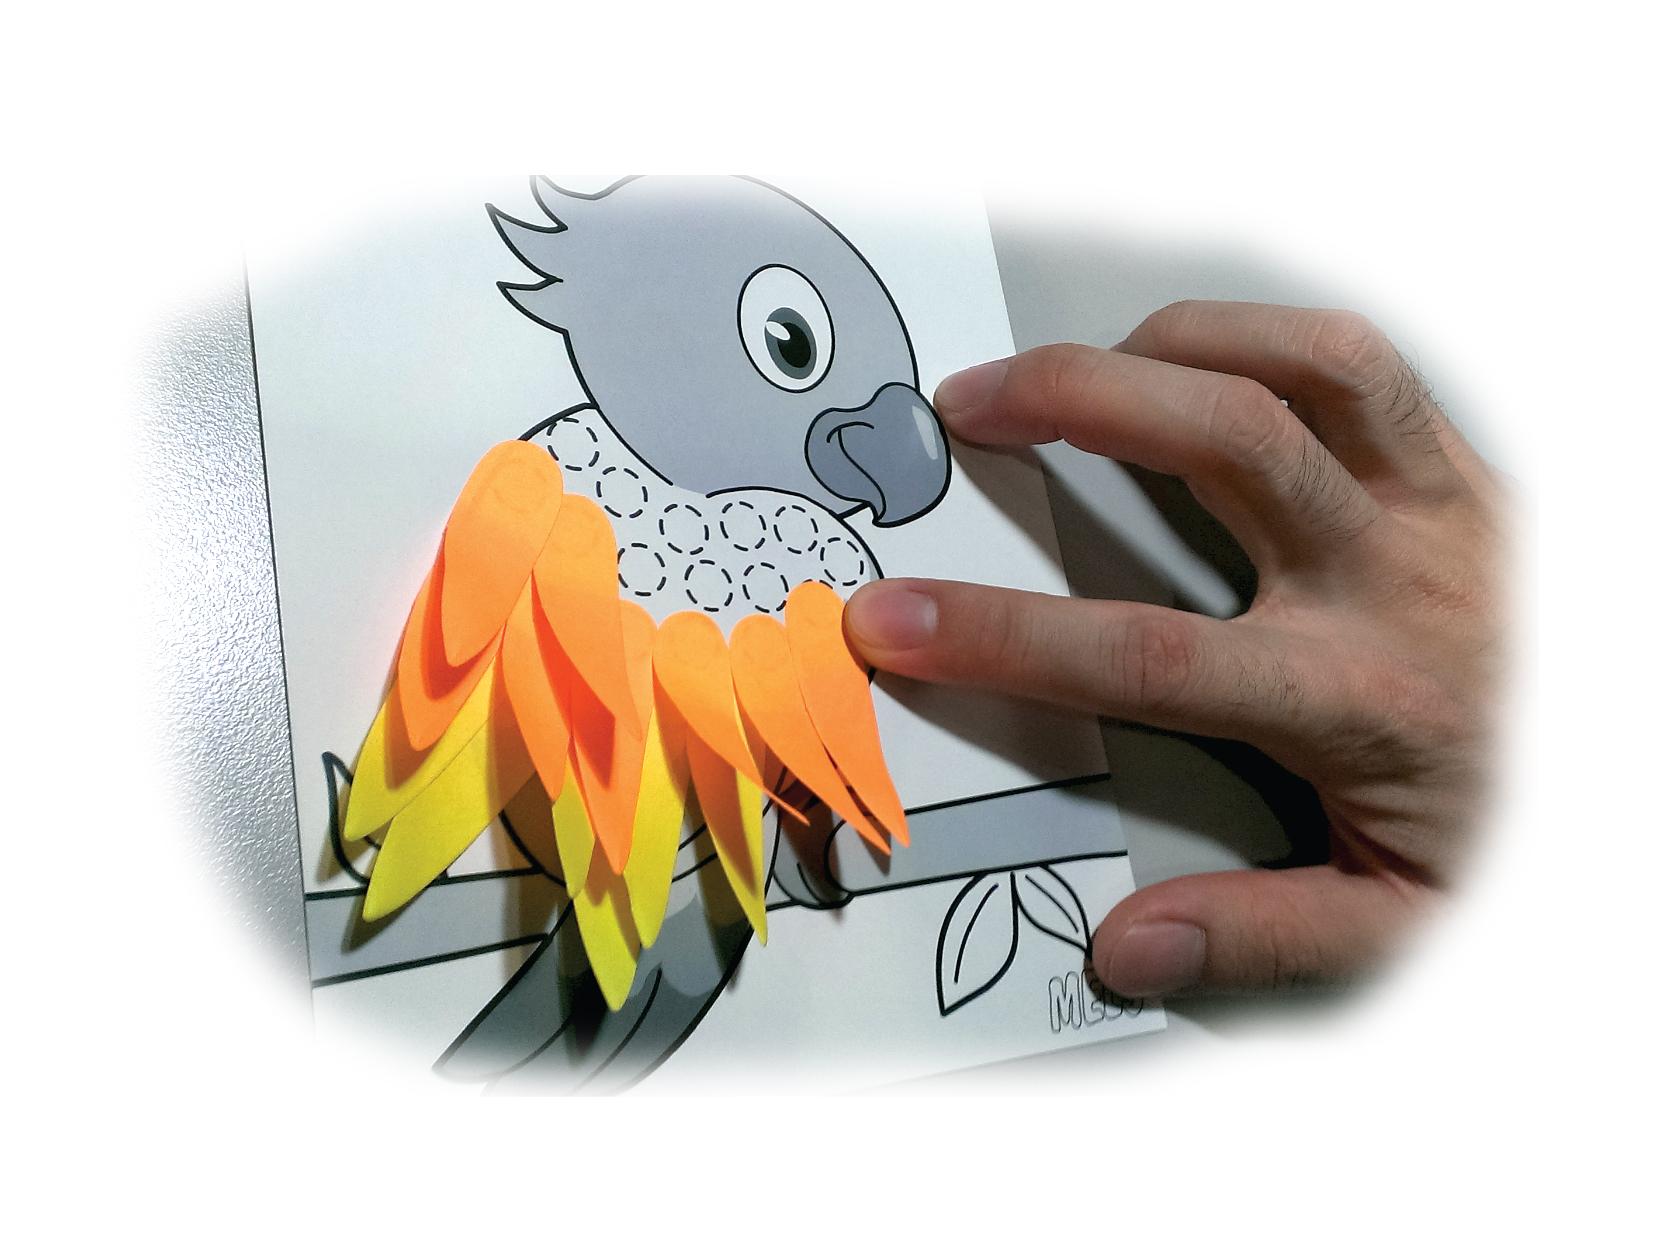 Project 9.1 A Parrot